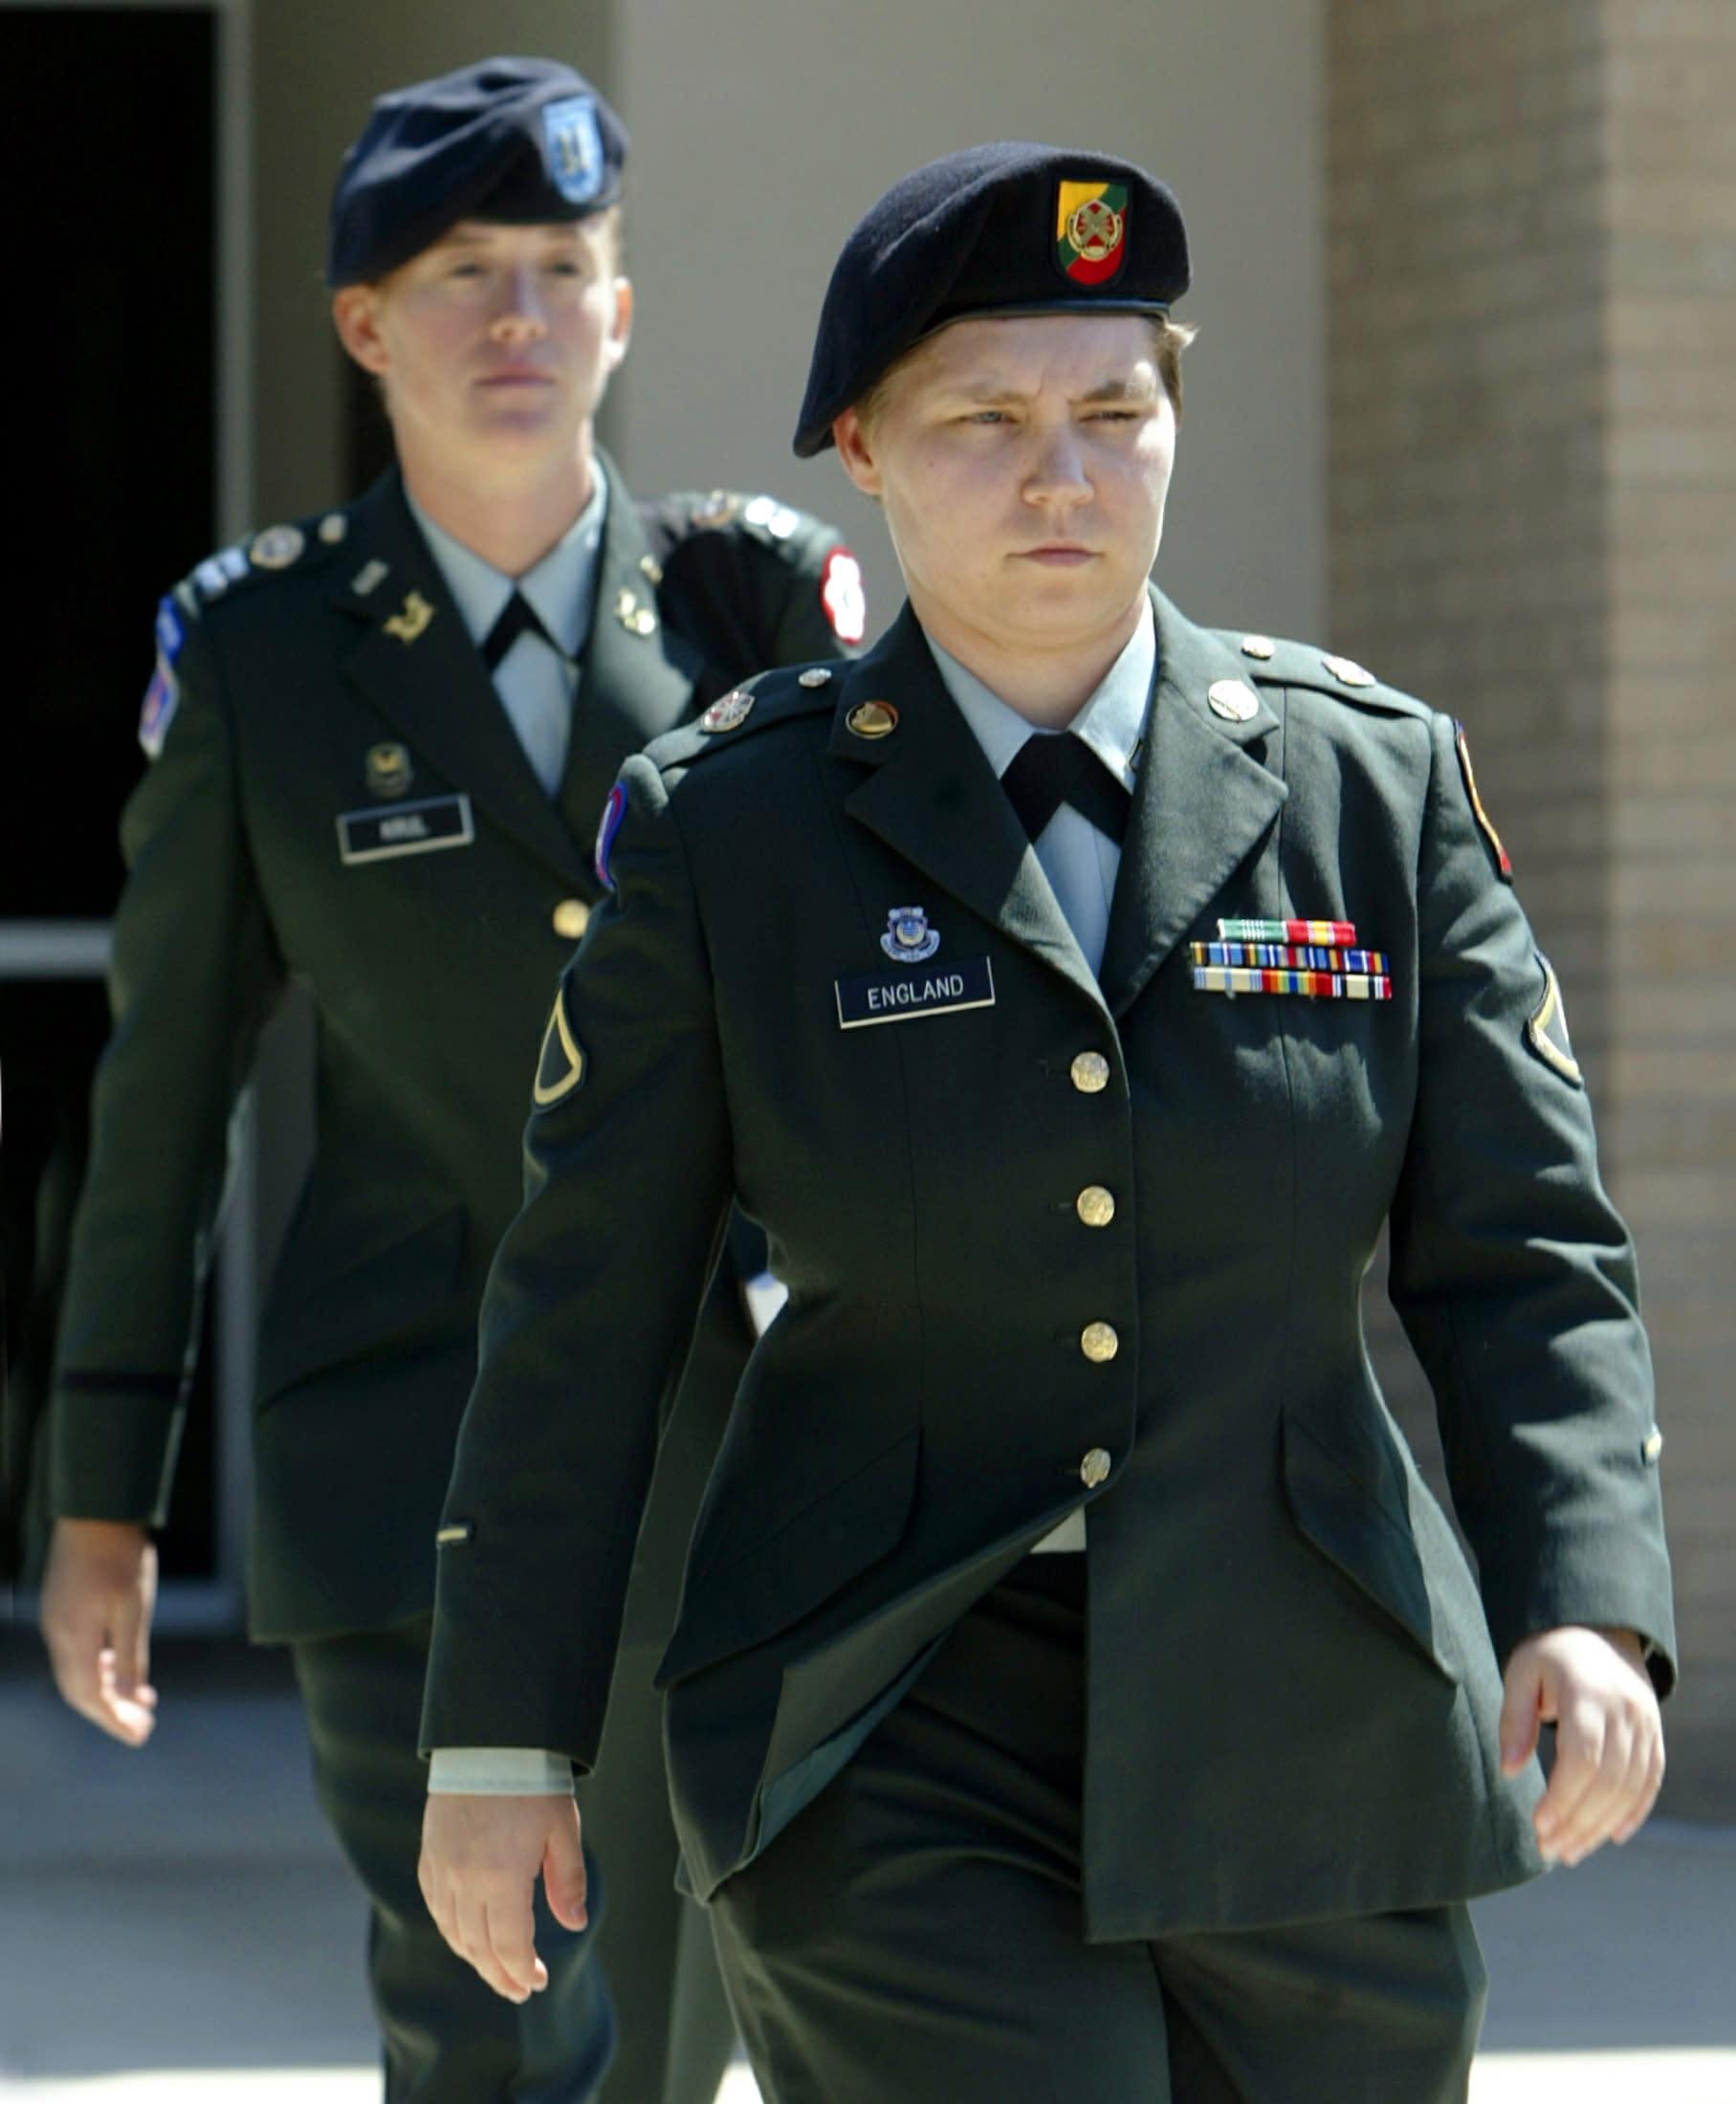 Abu Ghraib guard gets 6-month term | The Spokesman-Review